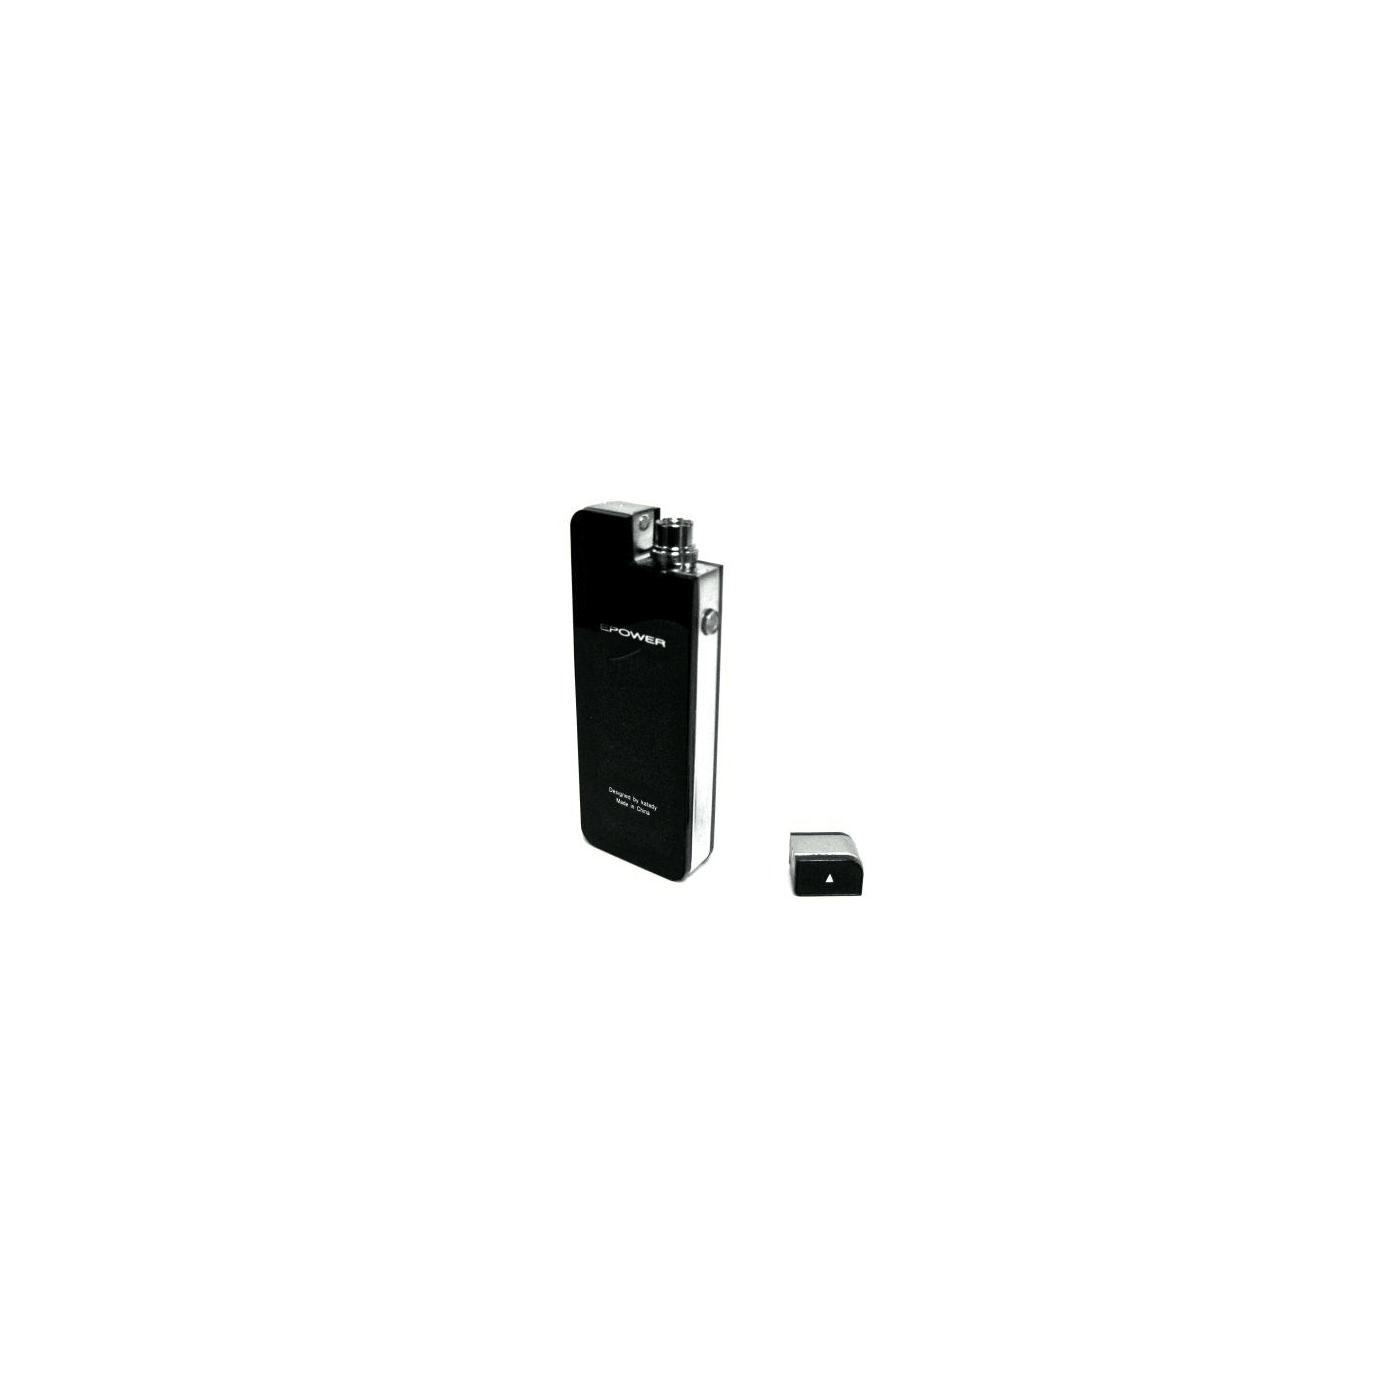 E-Power 1800 mAh Mod